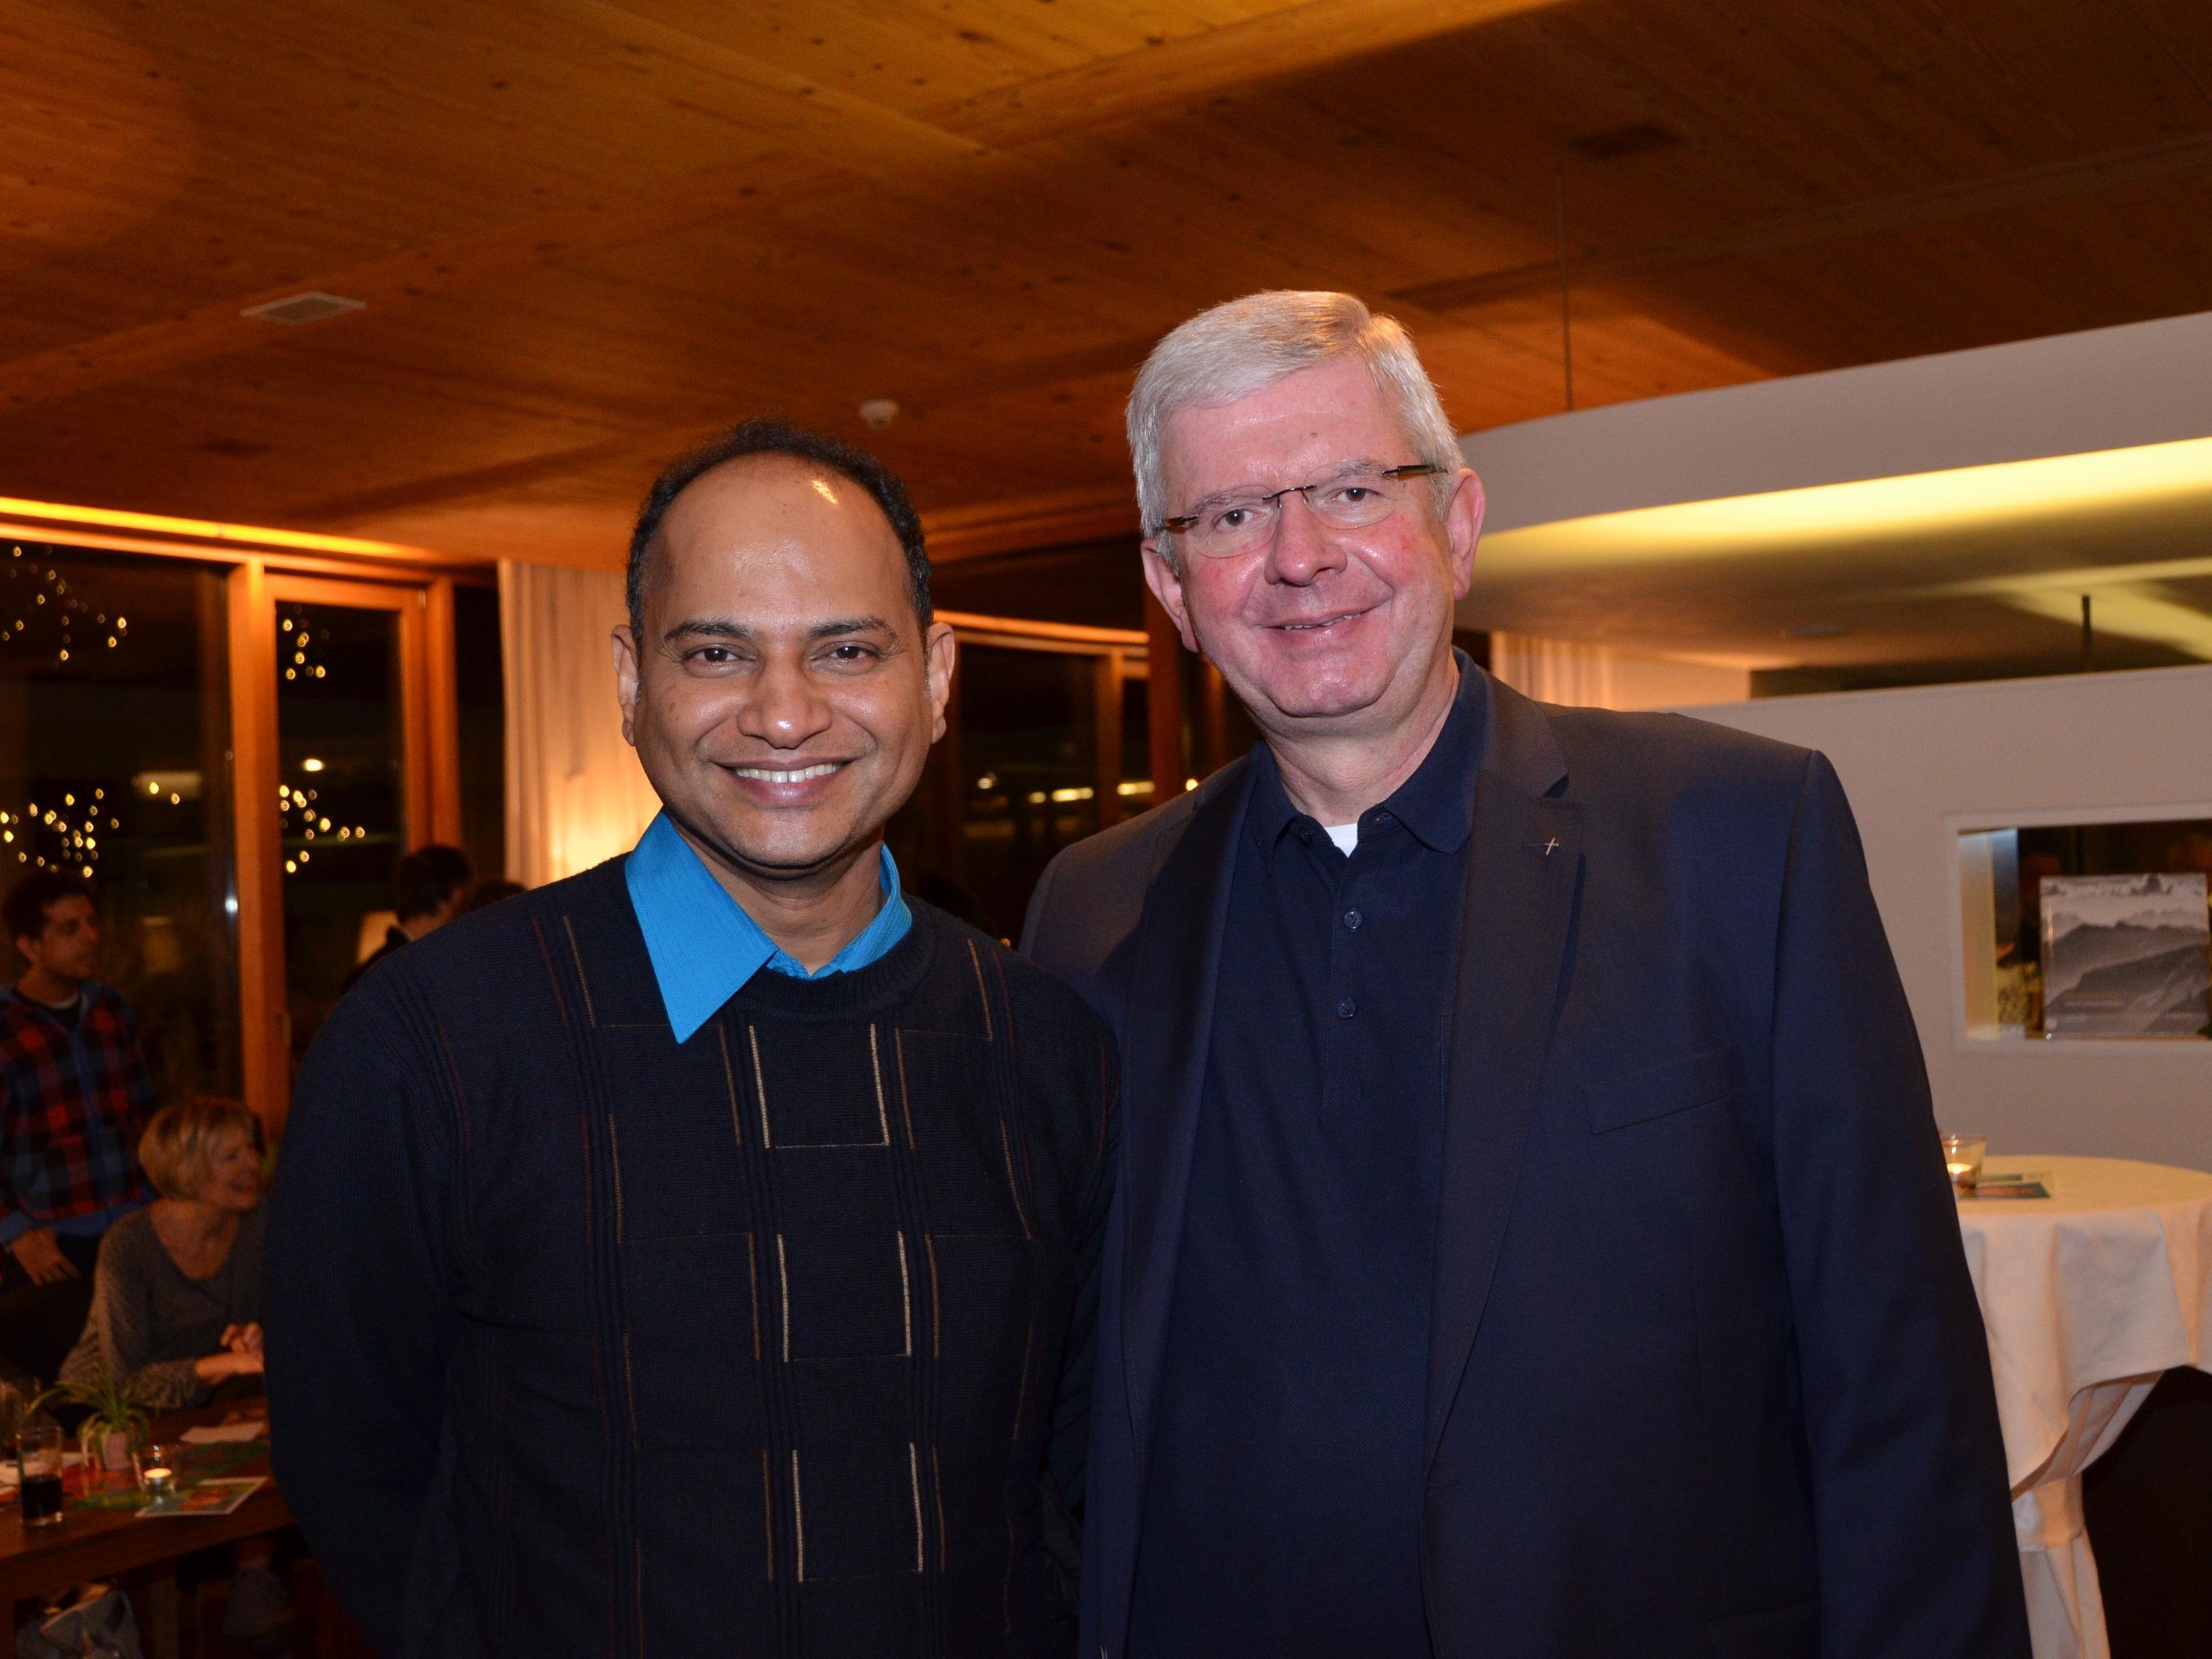 Pfr. Jose Chelangara und Pater Adrian